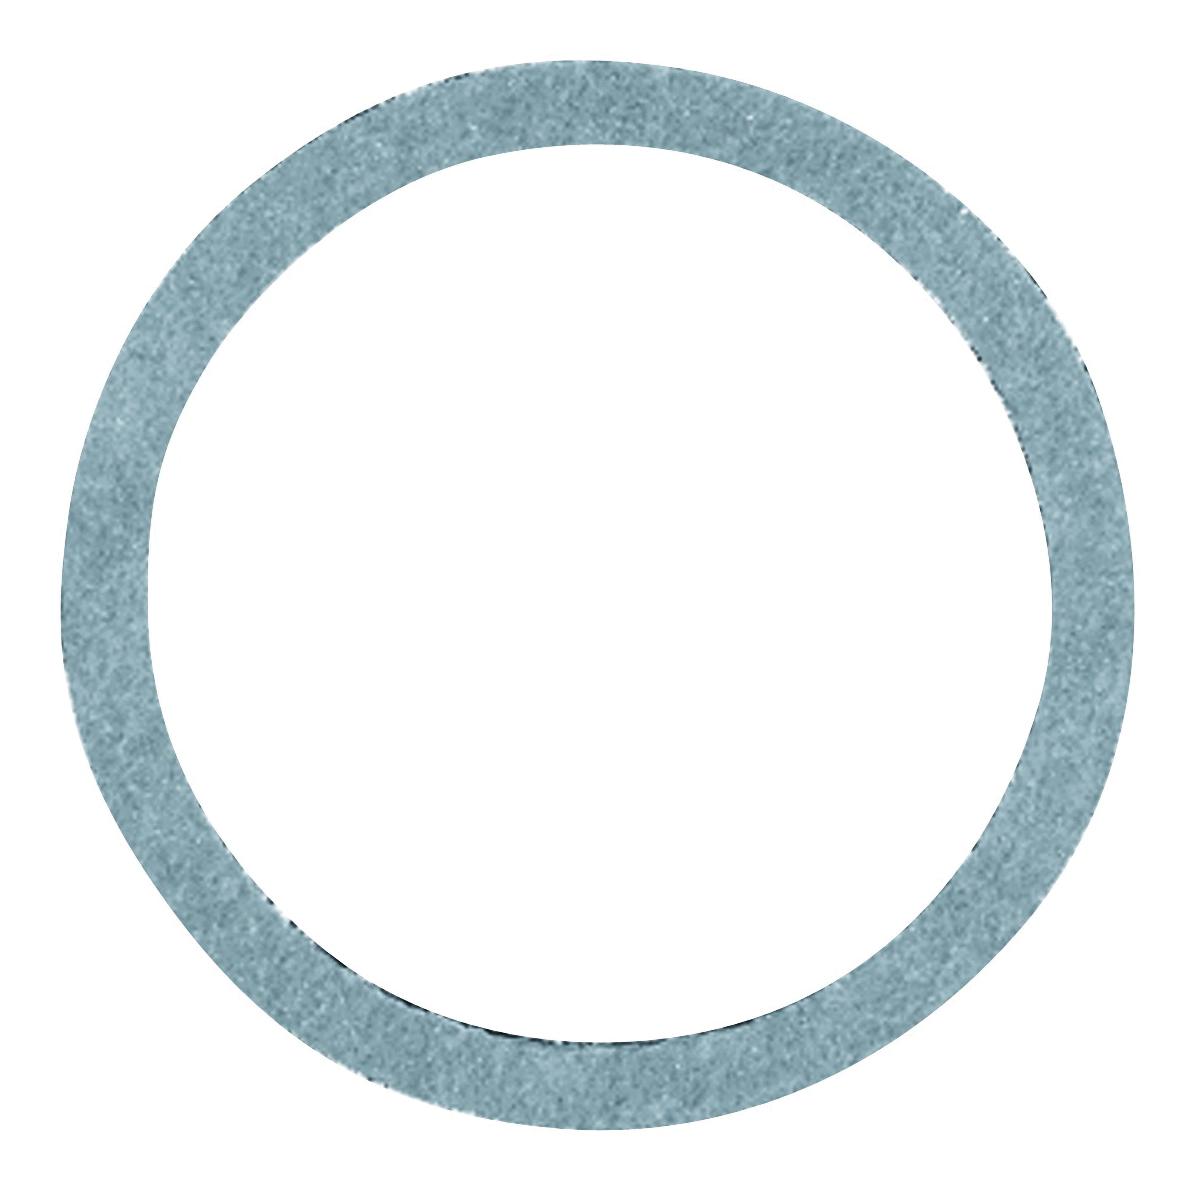 Picture of Danco 35580B Cap Thread Gasket, #45, 7/8 in ID x 1-1/16 in OD Dia, 1/16 in Thick, Nylon